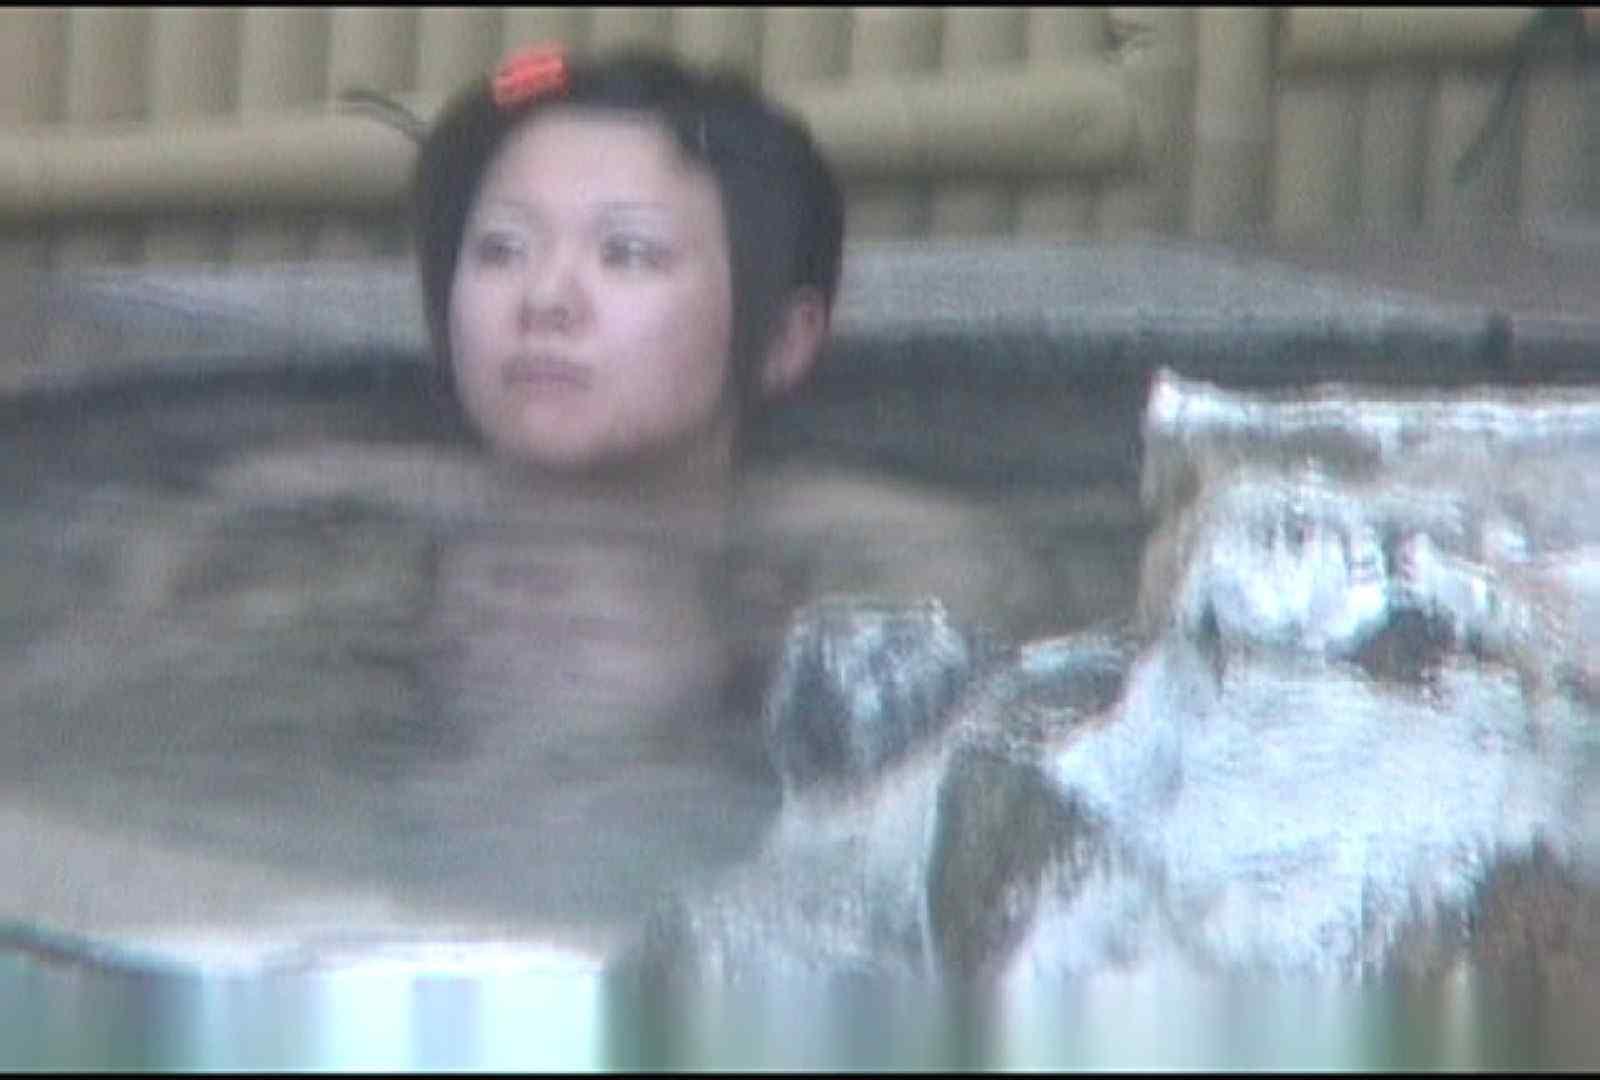 Aquaな露天風呂Vol.175 盗撮シリーズ | 露天風呂編  91PIX 75